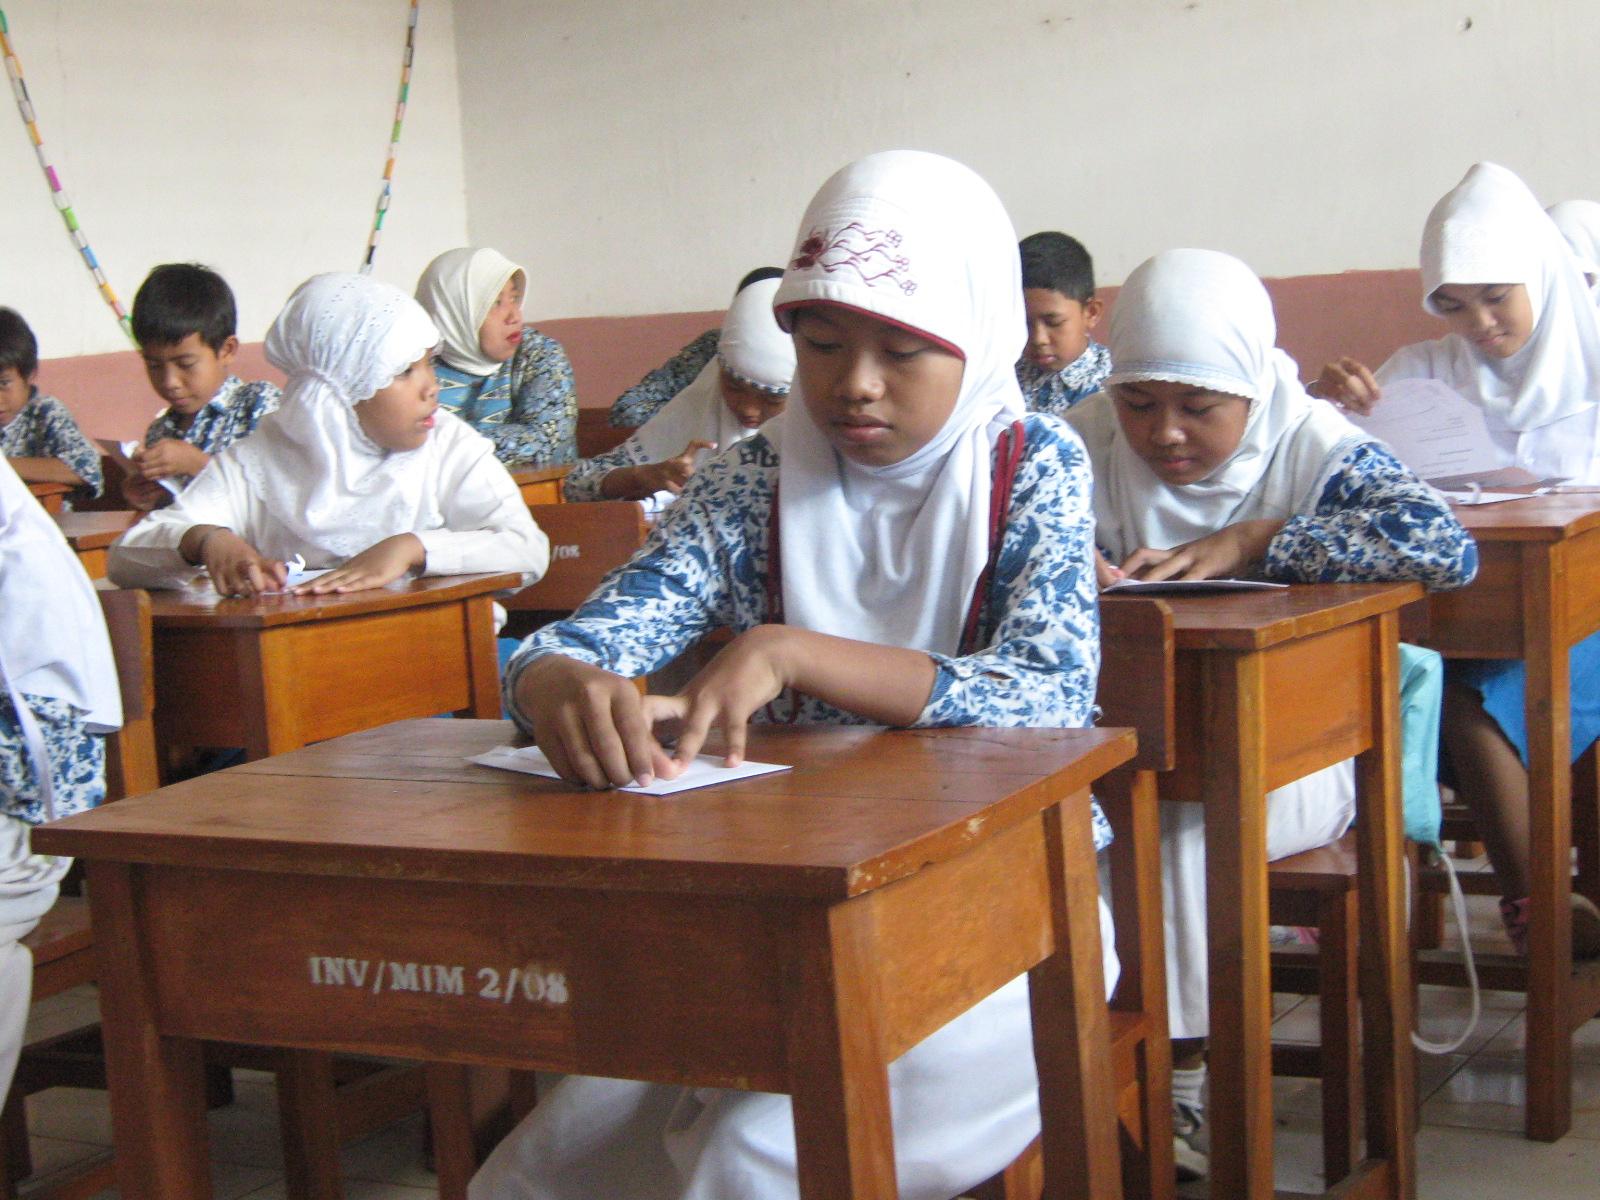 Try Out Uambn Ski Madrasah Ibtidaiyah Mi Tahun Pelajaran 2012 2013